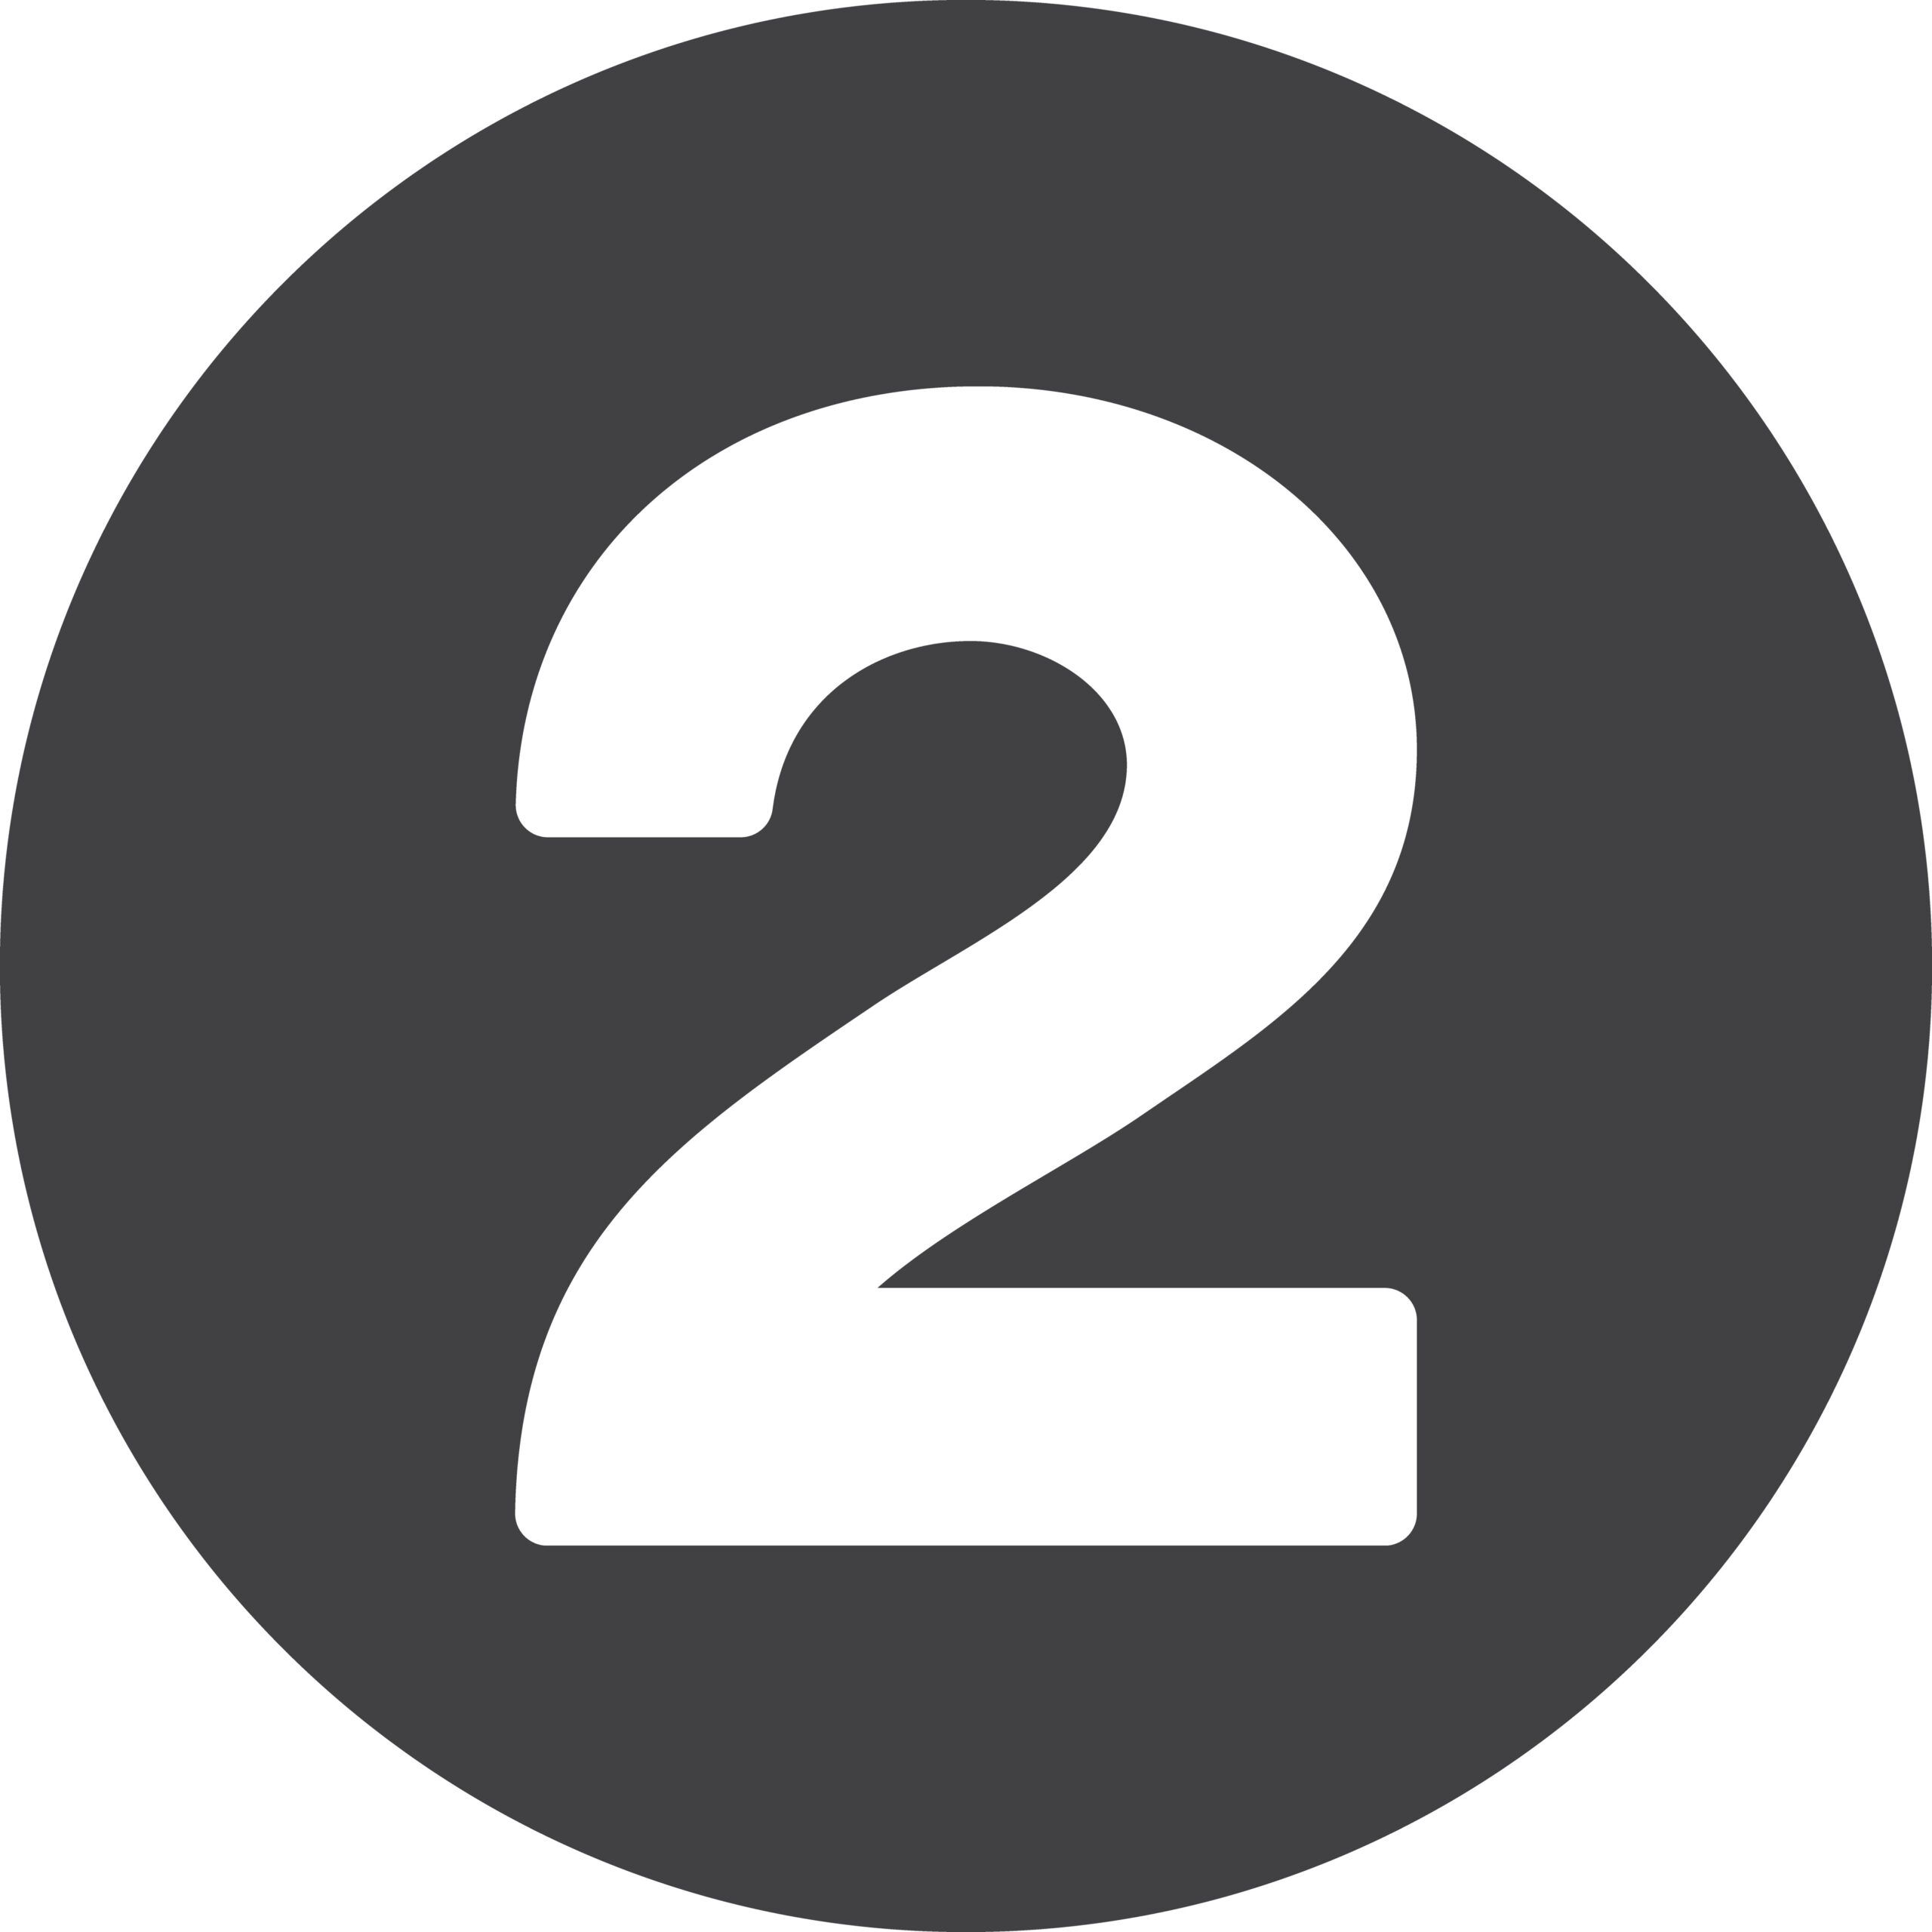 Number flat icon, circular sign